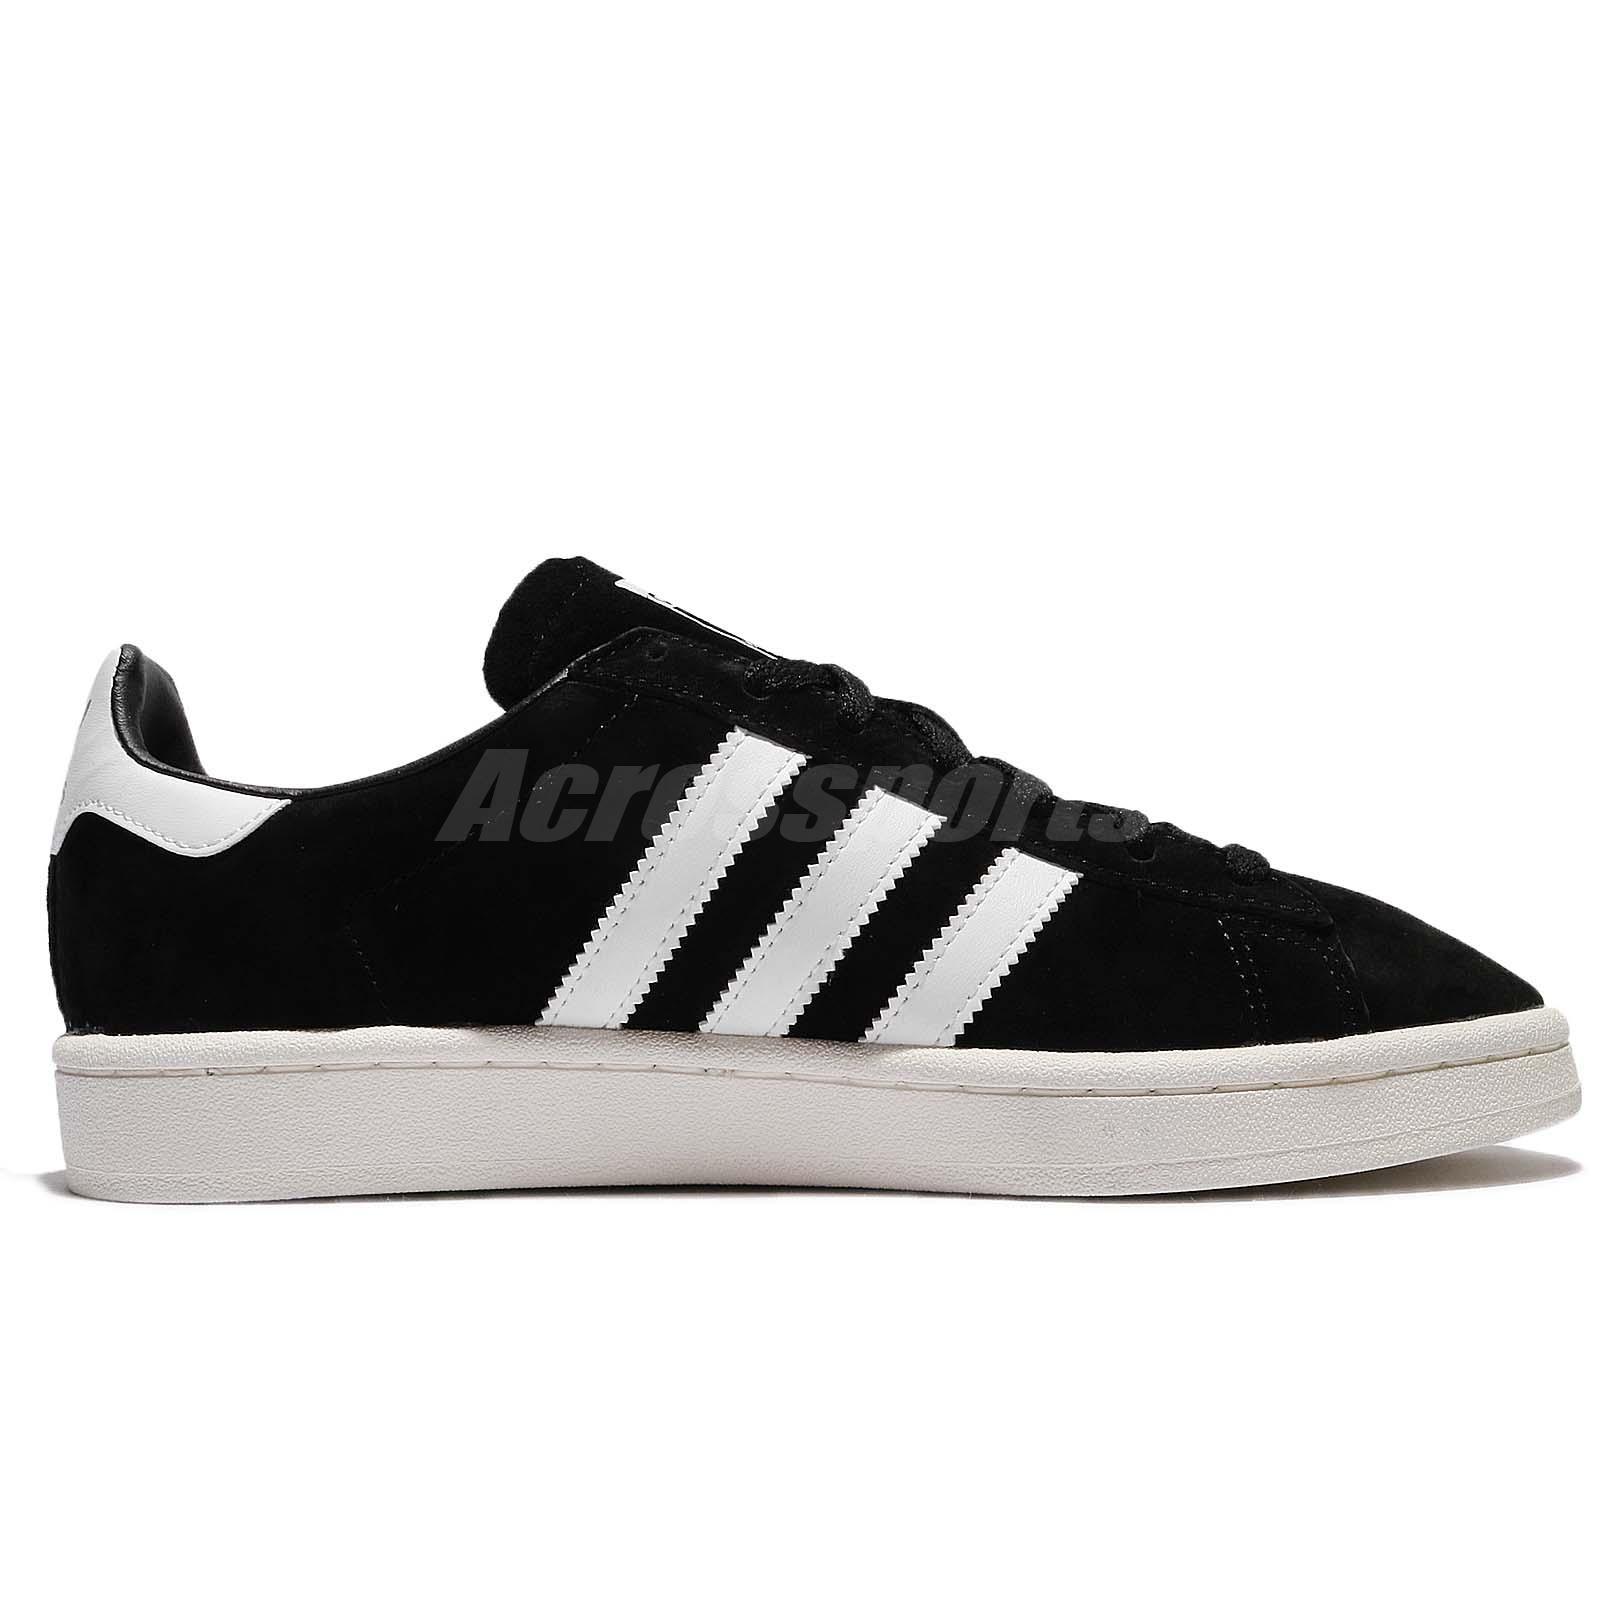 Details about adidas Originals Campus Black White Men Old School Shoes Sneakers BZ0084